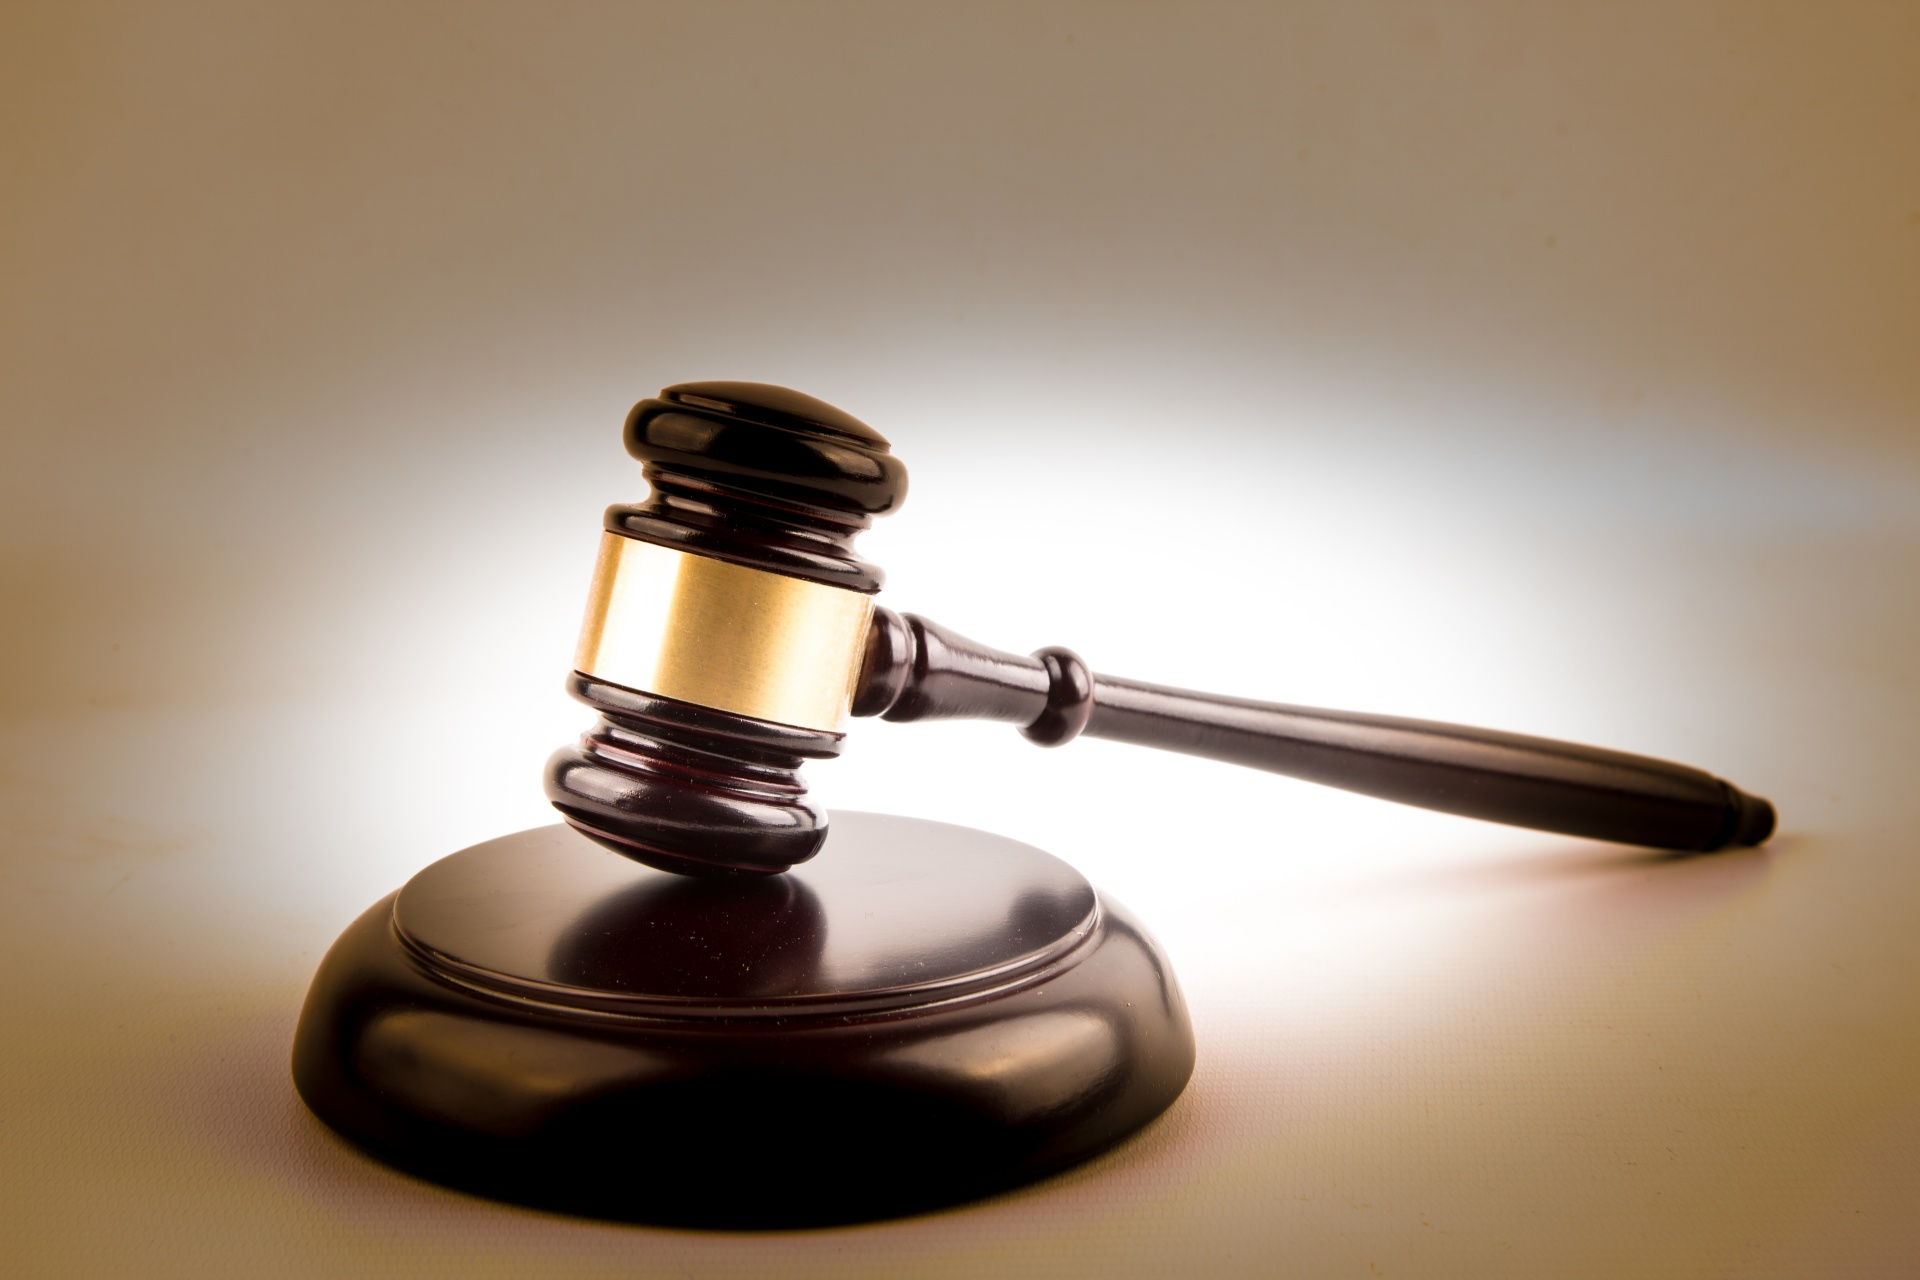 judge-gavel-1461291738X4g_1559859339937.jpg